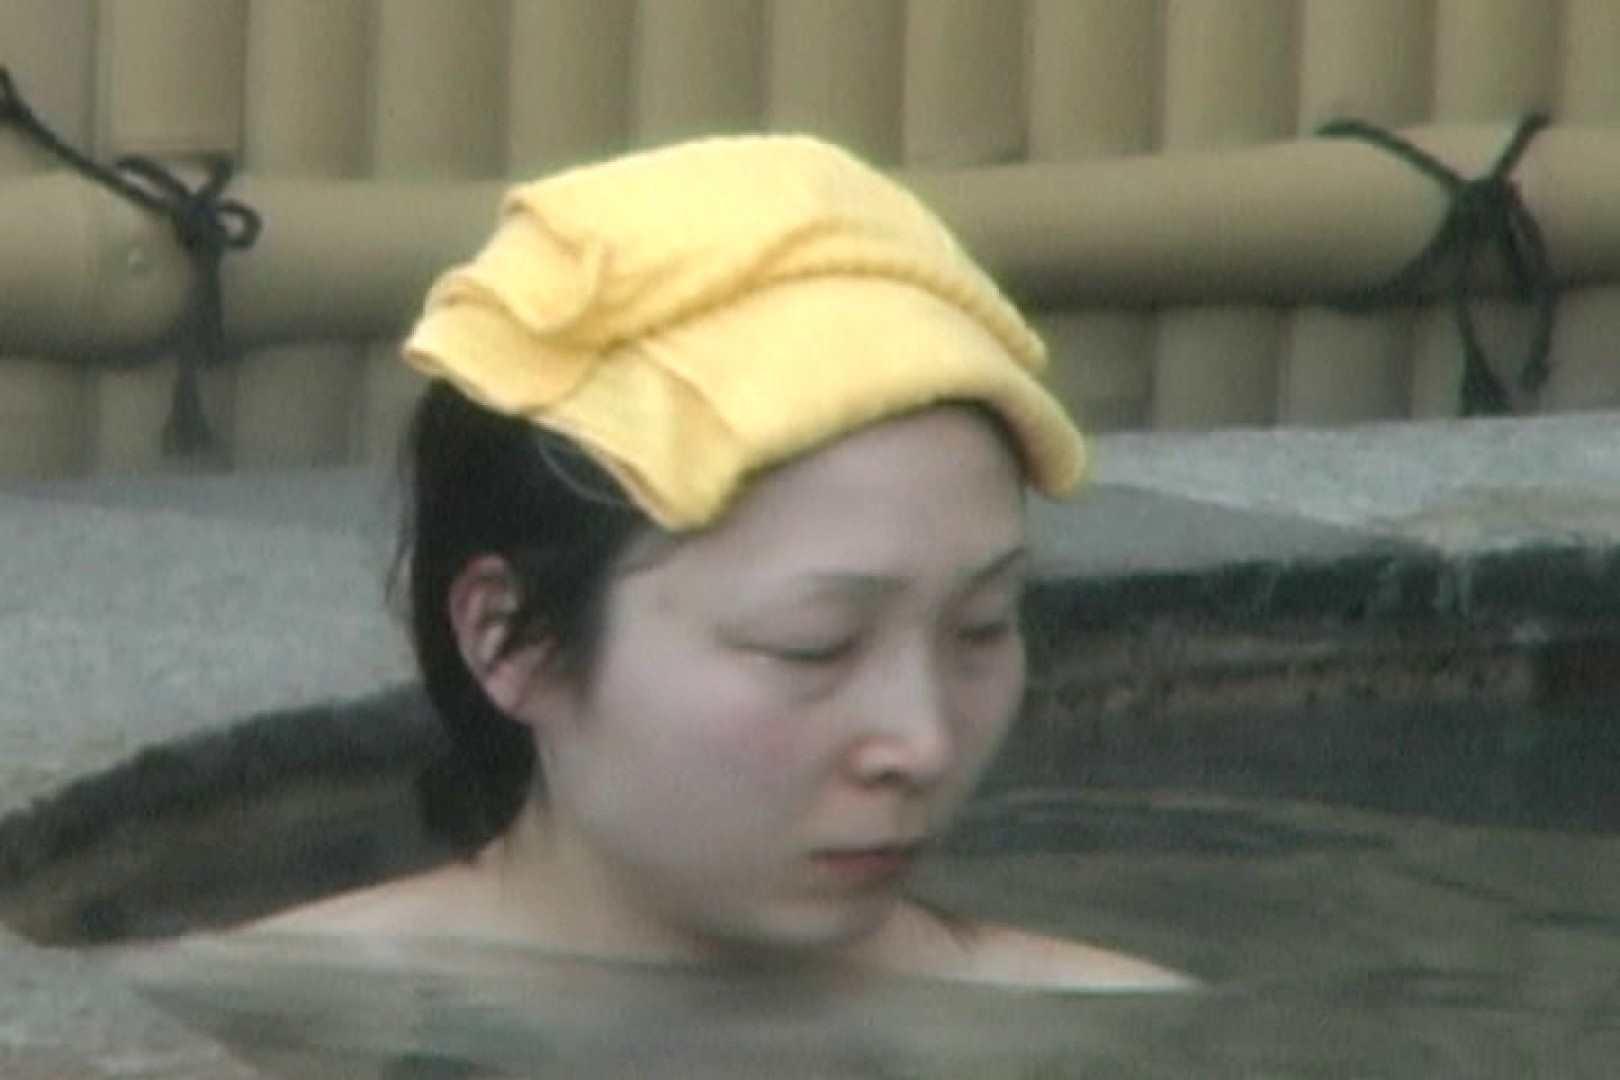 Aquaな露天風呂Vol.596 盗撮シリーズ | 露天風呂編  113PIX 49